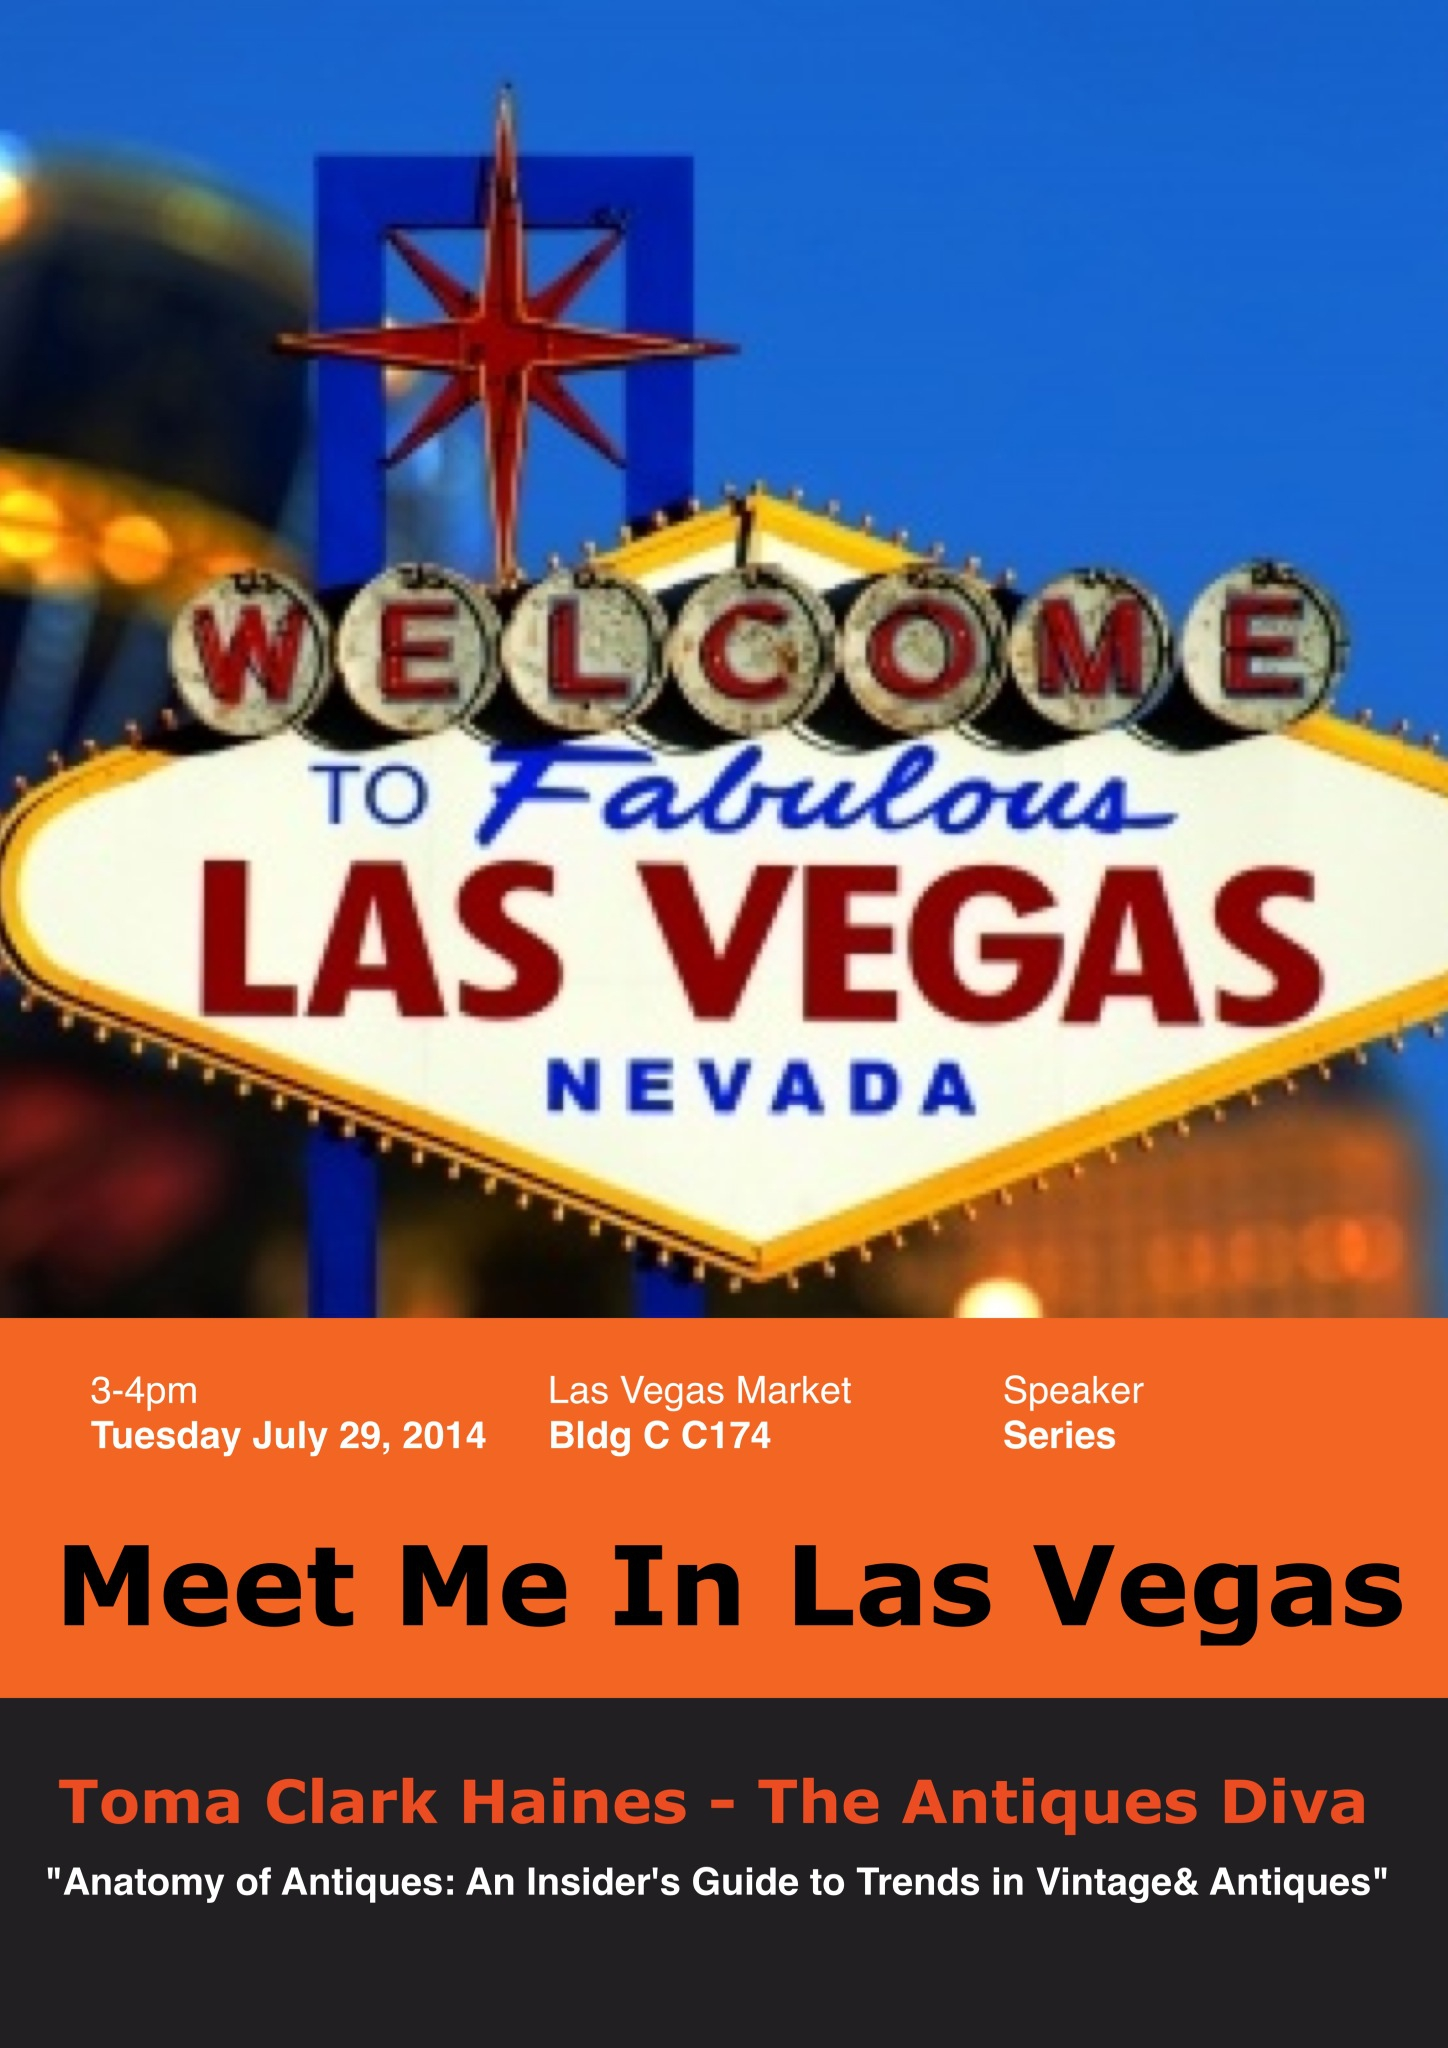 Las Vegas Market, Toma Clark Haines, The Antiques Diva Speaking Engagement, Timothy Corrigan, Susanna Salk, Thom Filicia, Michelle Nussbaumer, Scott Eckman, Trends in Antiques, Trends in Vintage